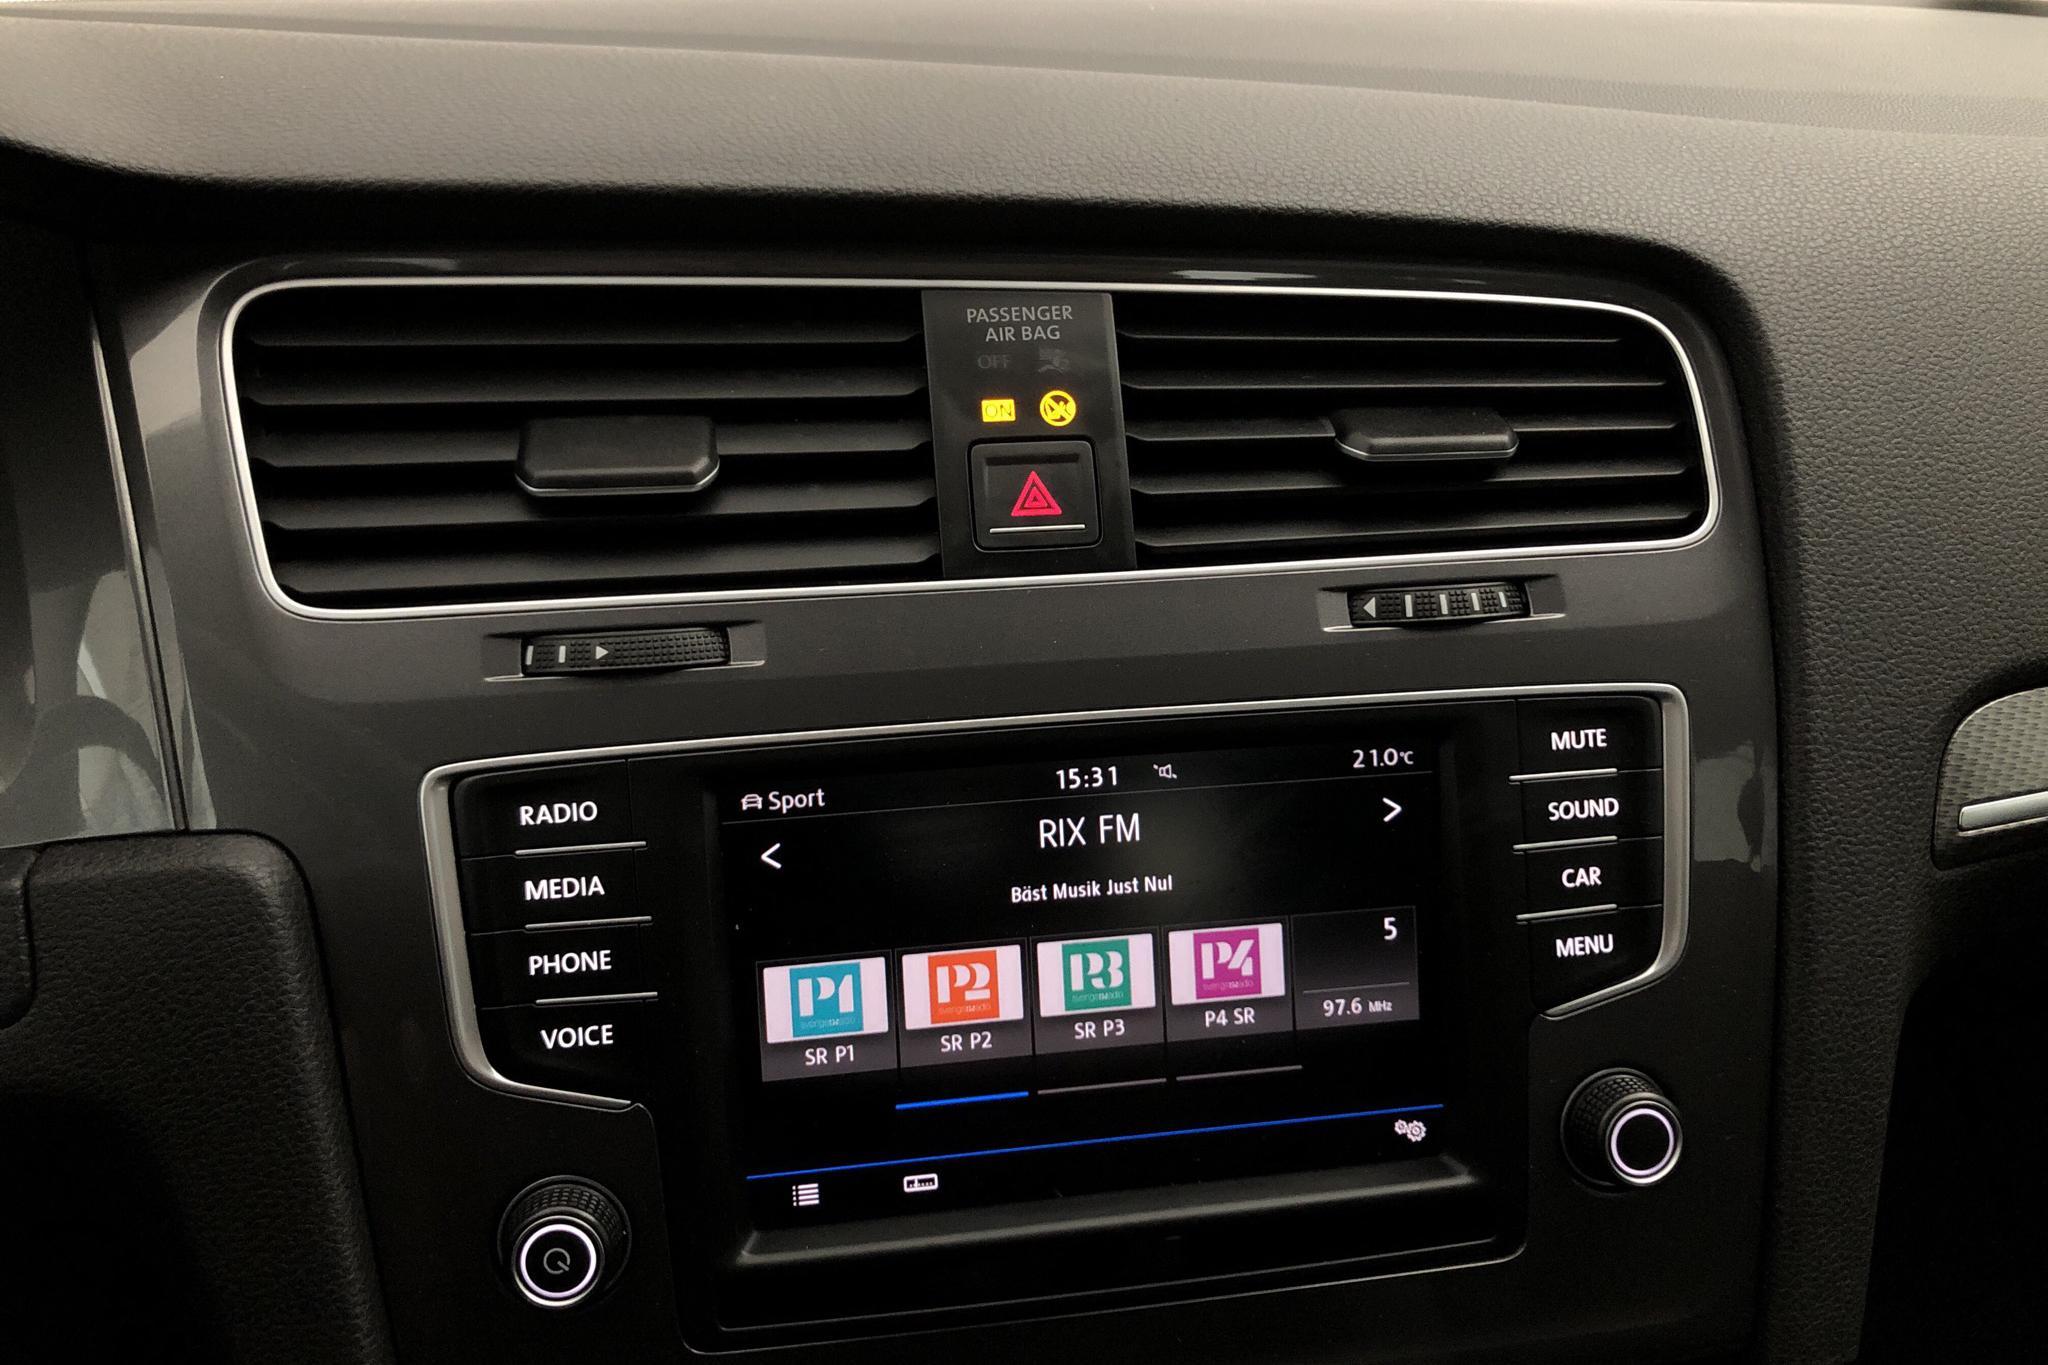 VW Golf Alltrack 1.8 TSI Sportscombi 4Motion (180hk) - 9 797 mil - Automat - röd - 2017